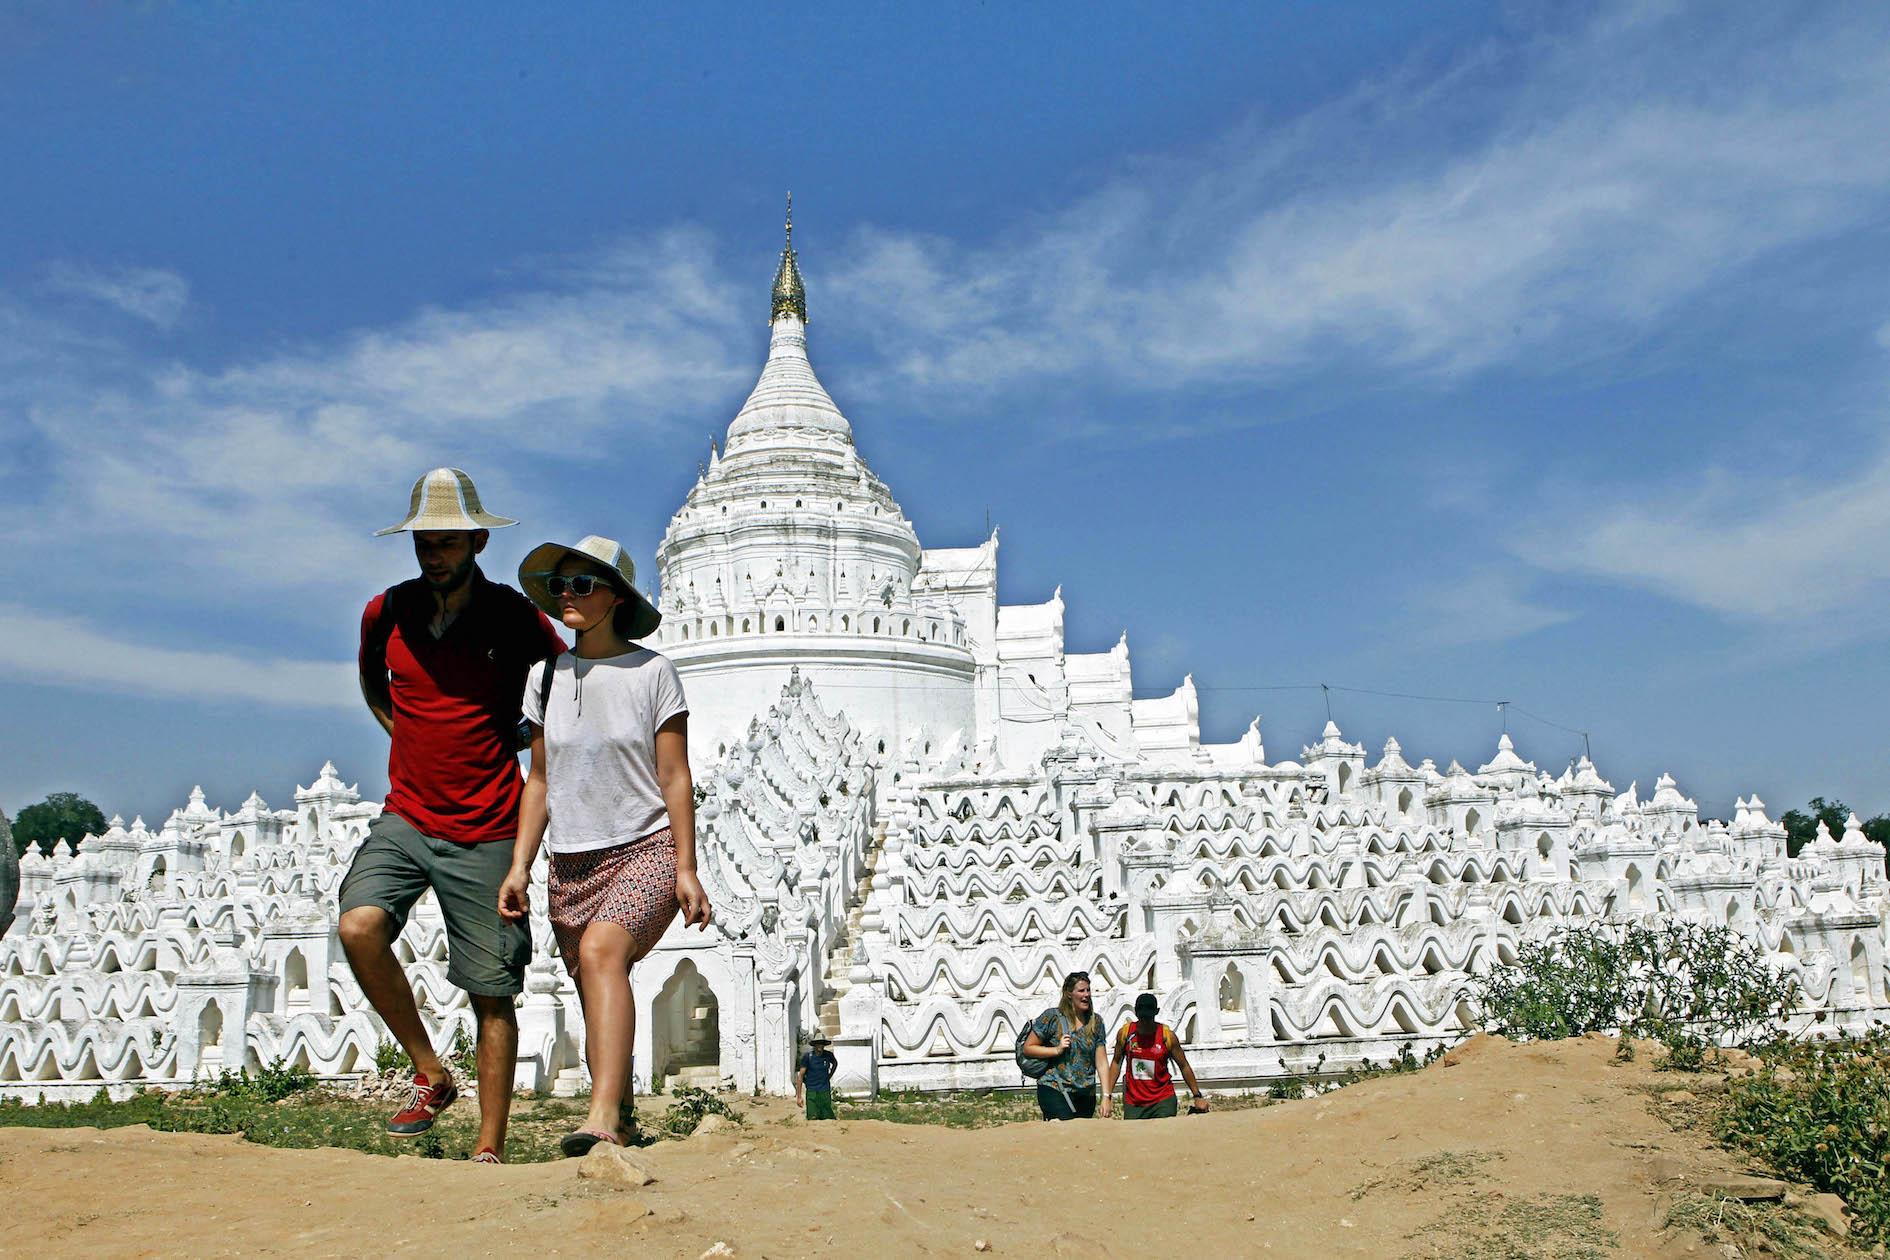 20160802-myanmar-tourism.jpg